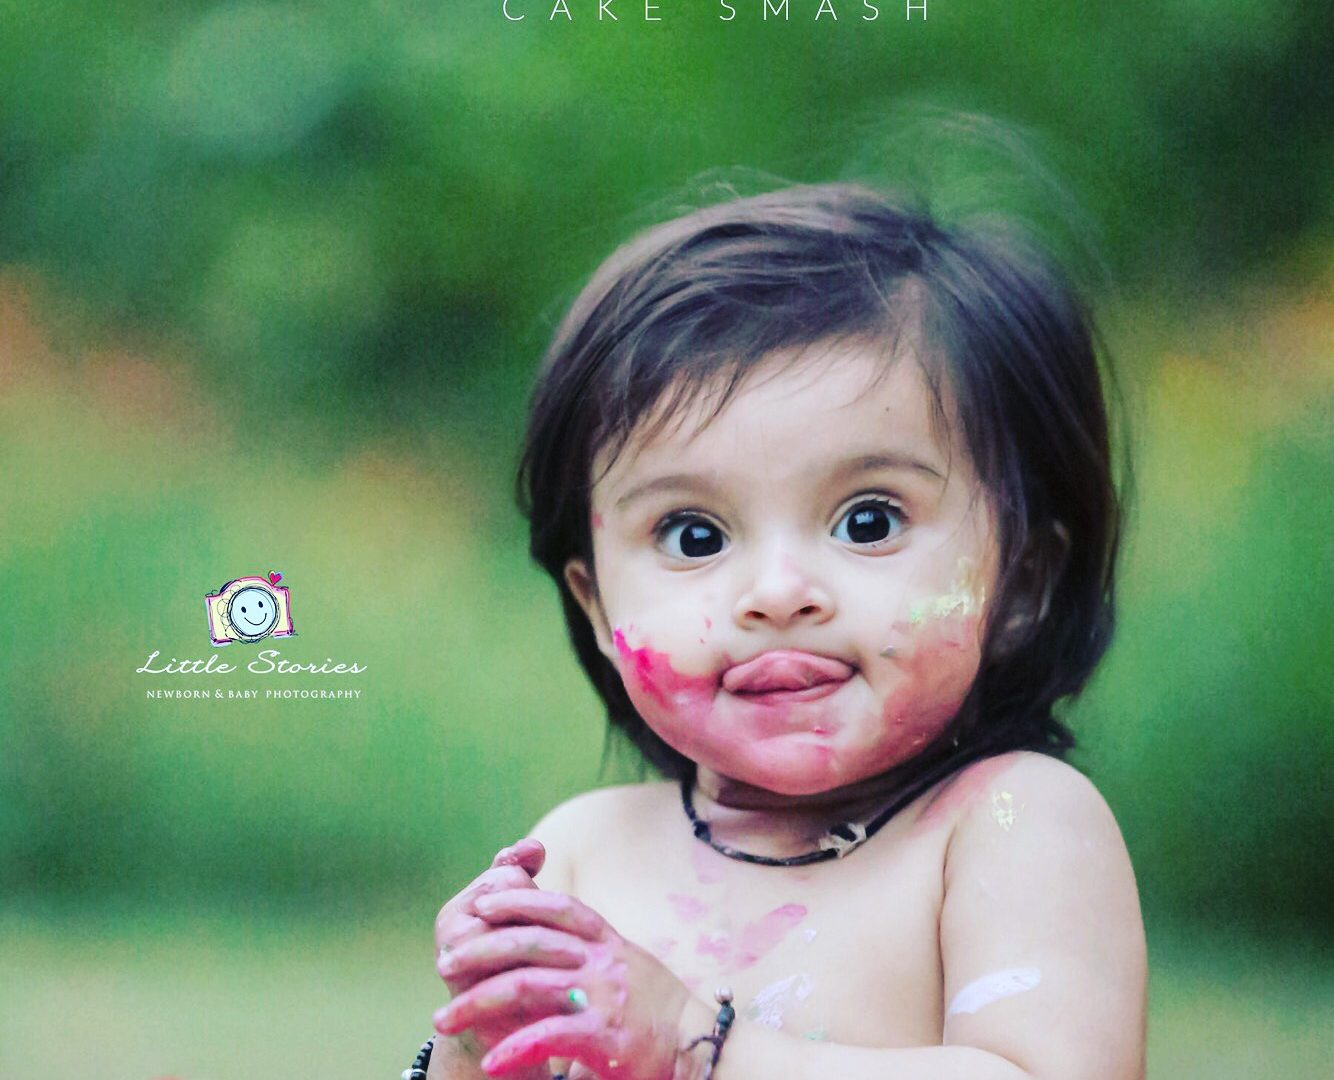 Cake Smash Baby Photography in Faridabad